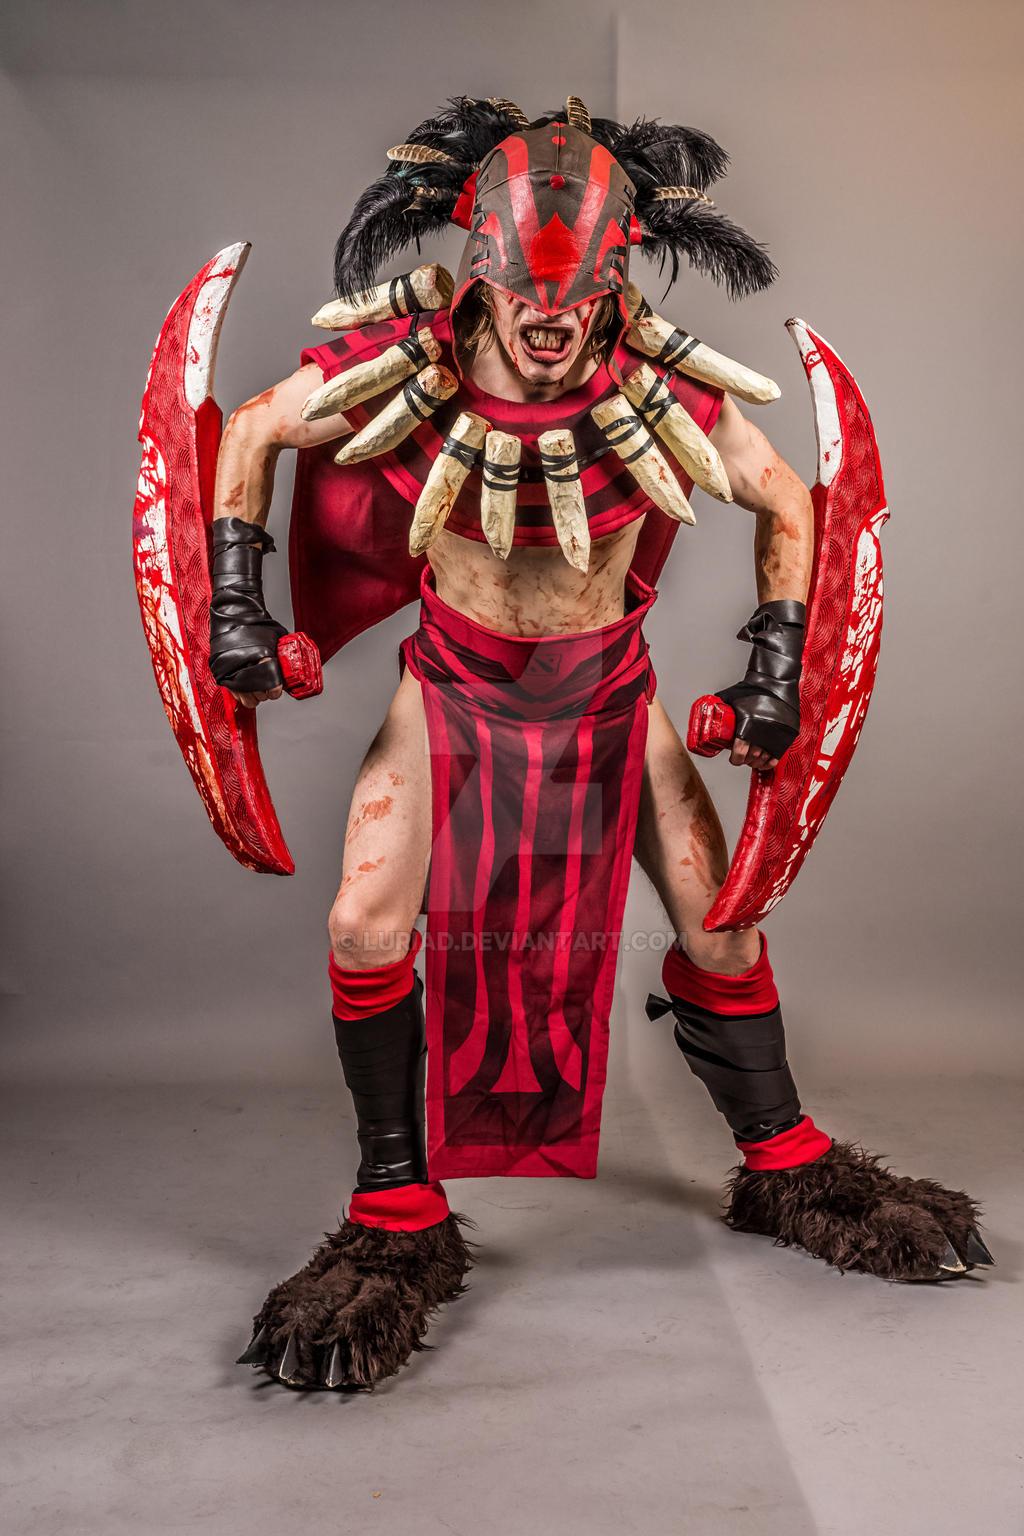 dota 2 bloodseeker cosplay by luriad on deviantart